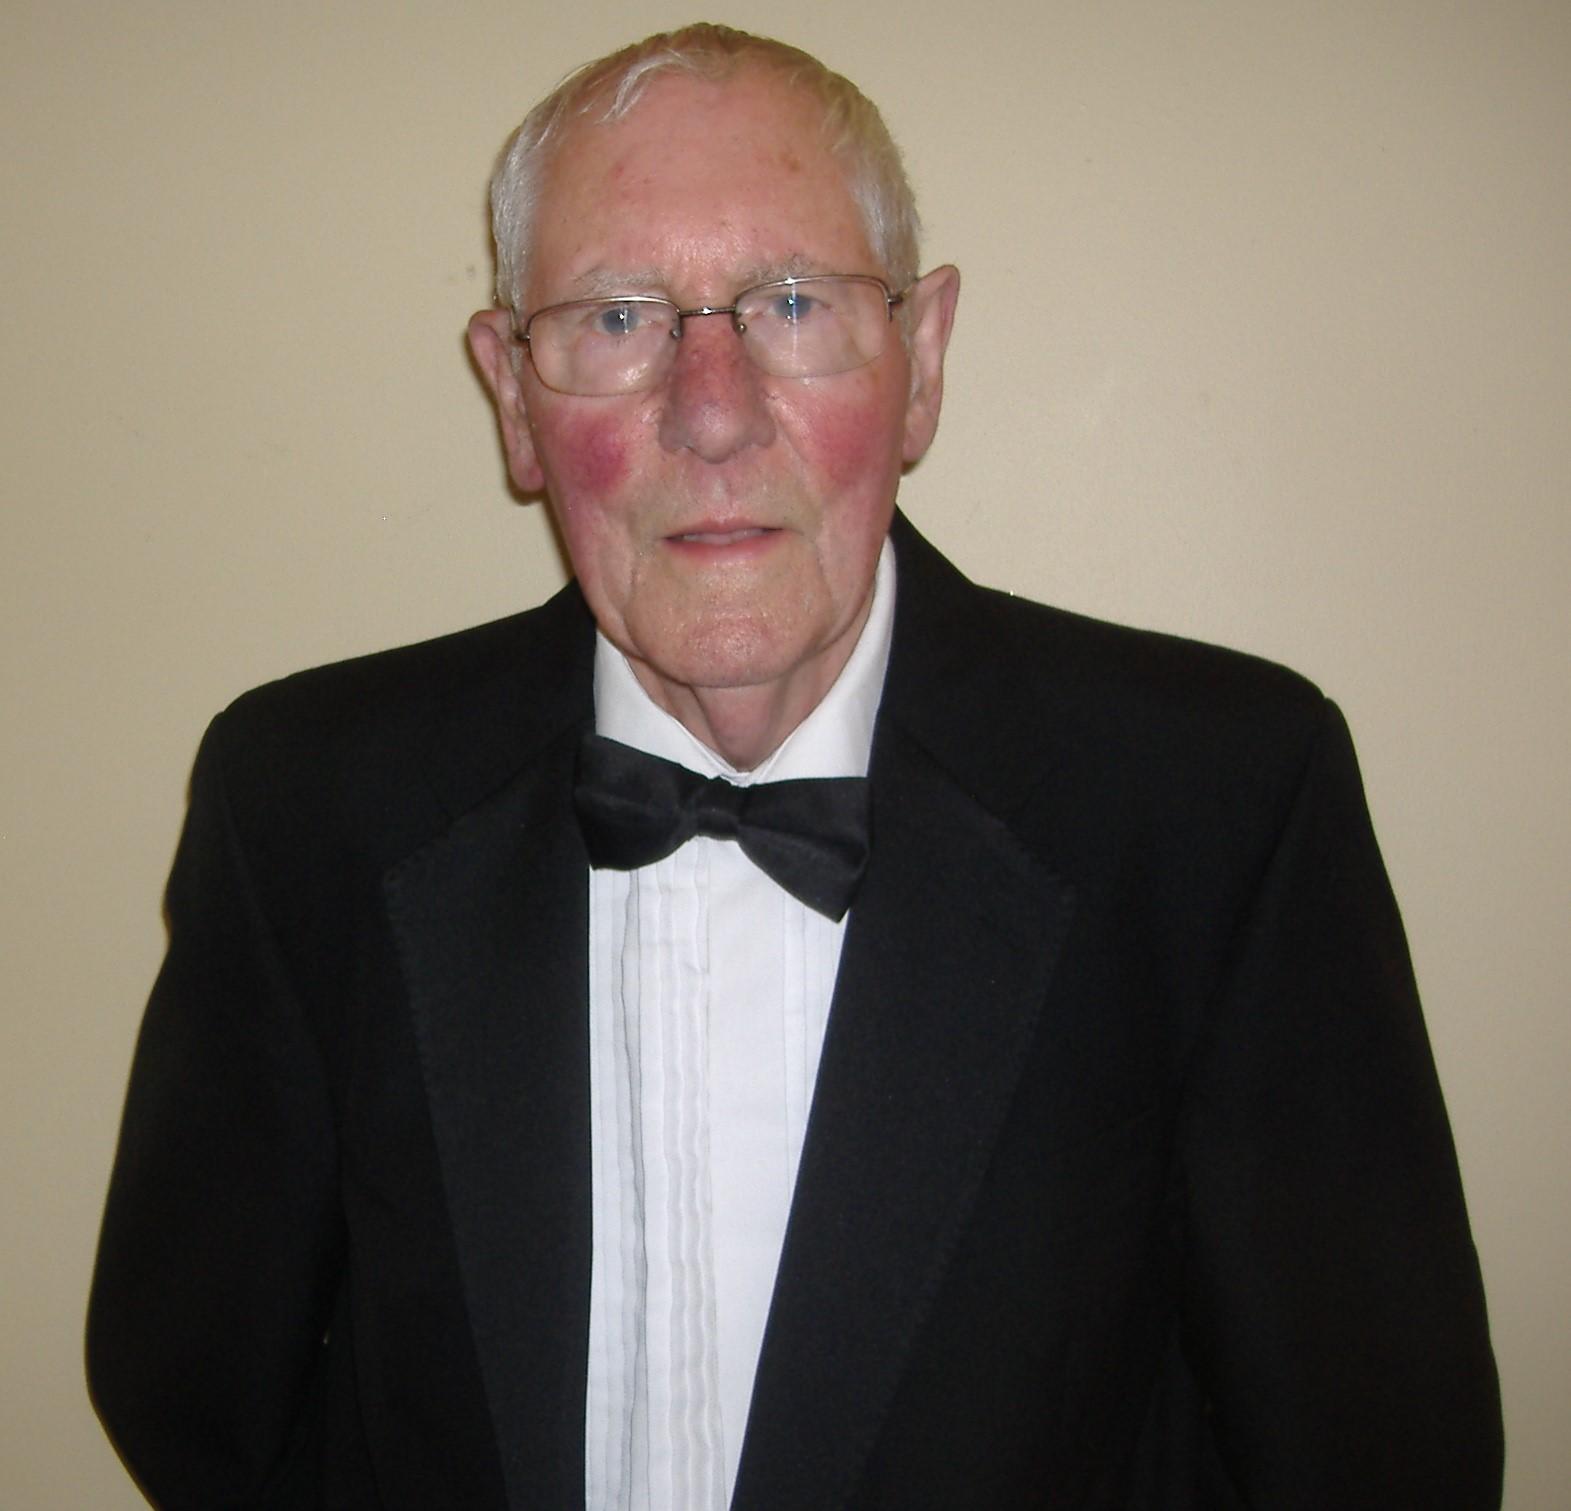 John Sinfield